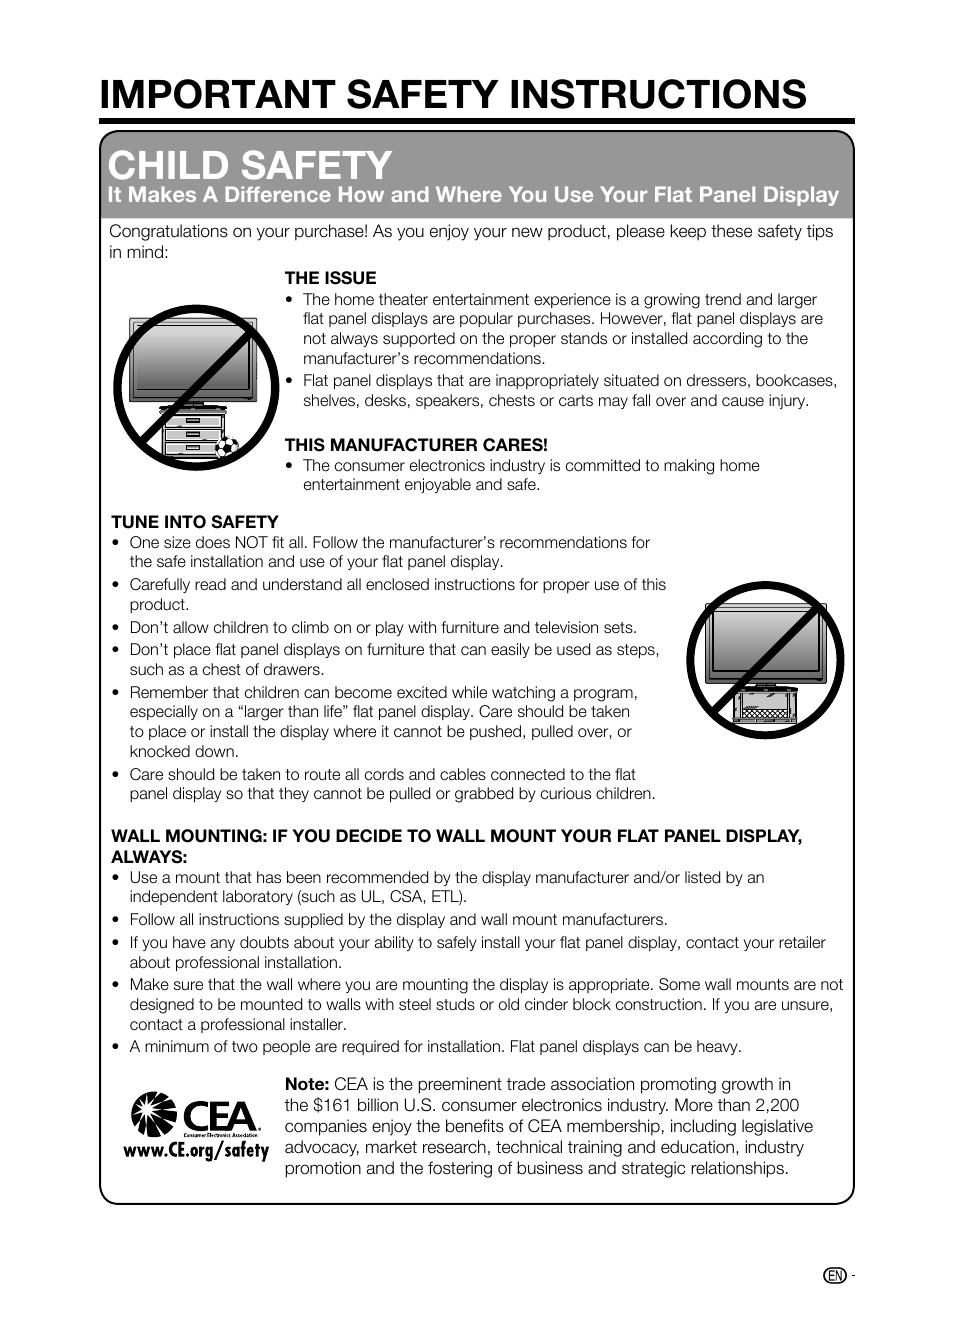 sharp instruction user manual open source user manual u2022 rh dramatic varieties com sharp user manual download sharp roku user manual